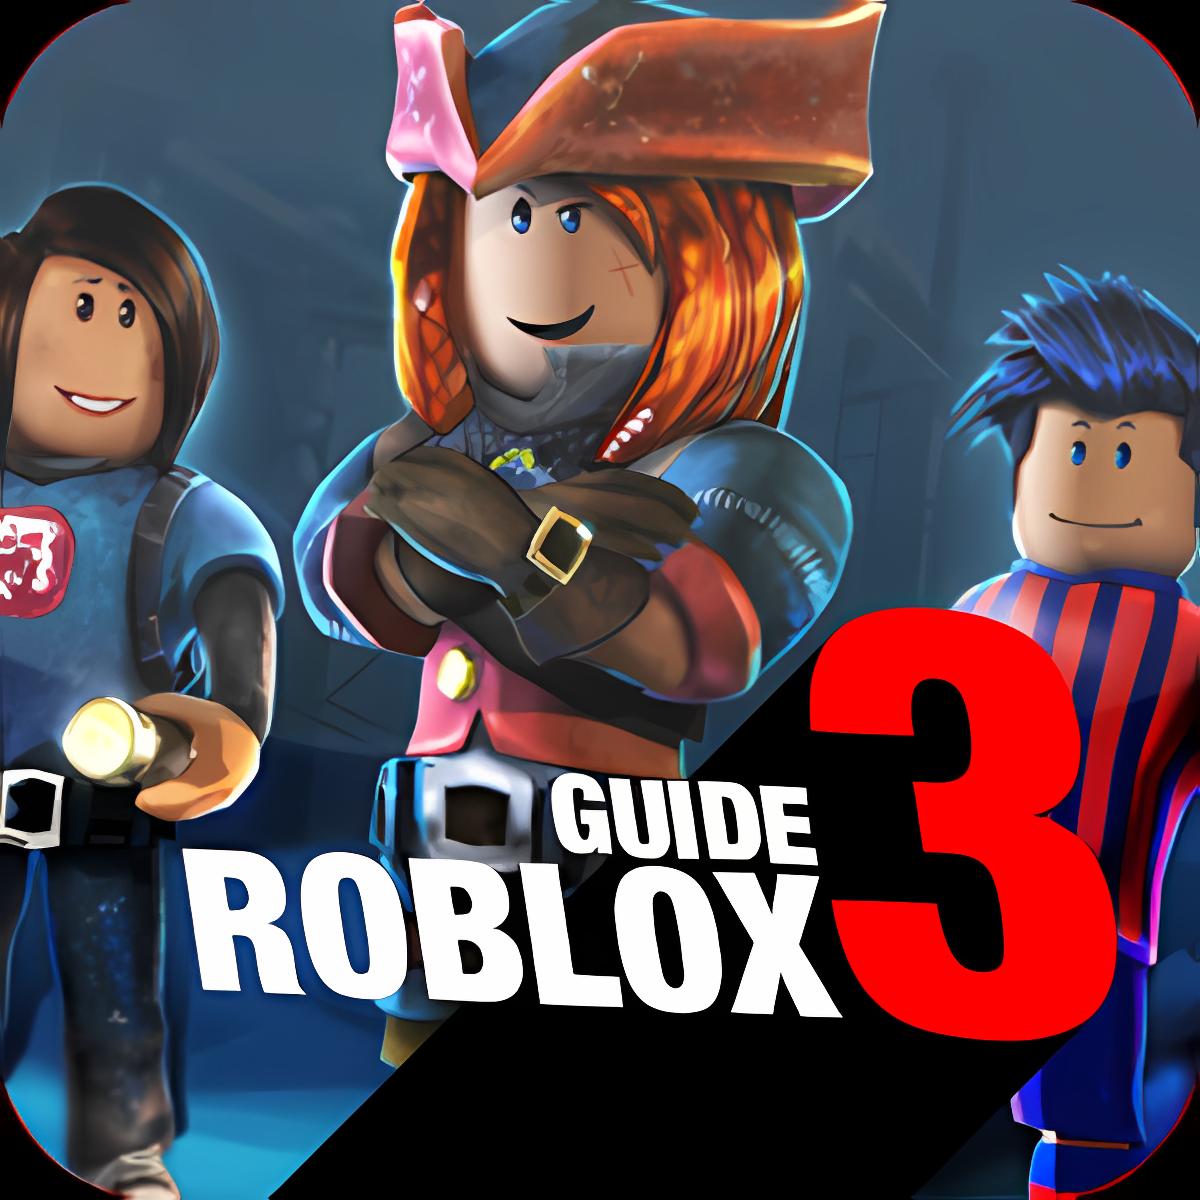 Free Roblox 3 Guide 1.1